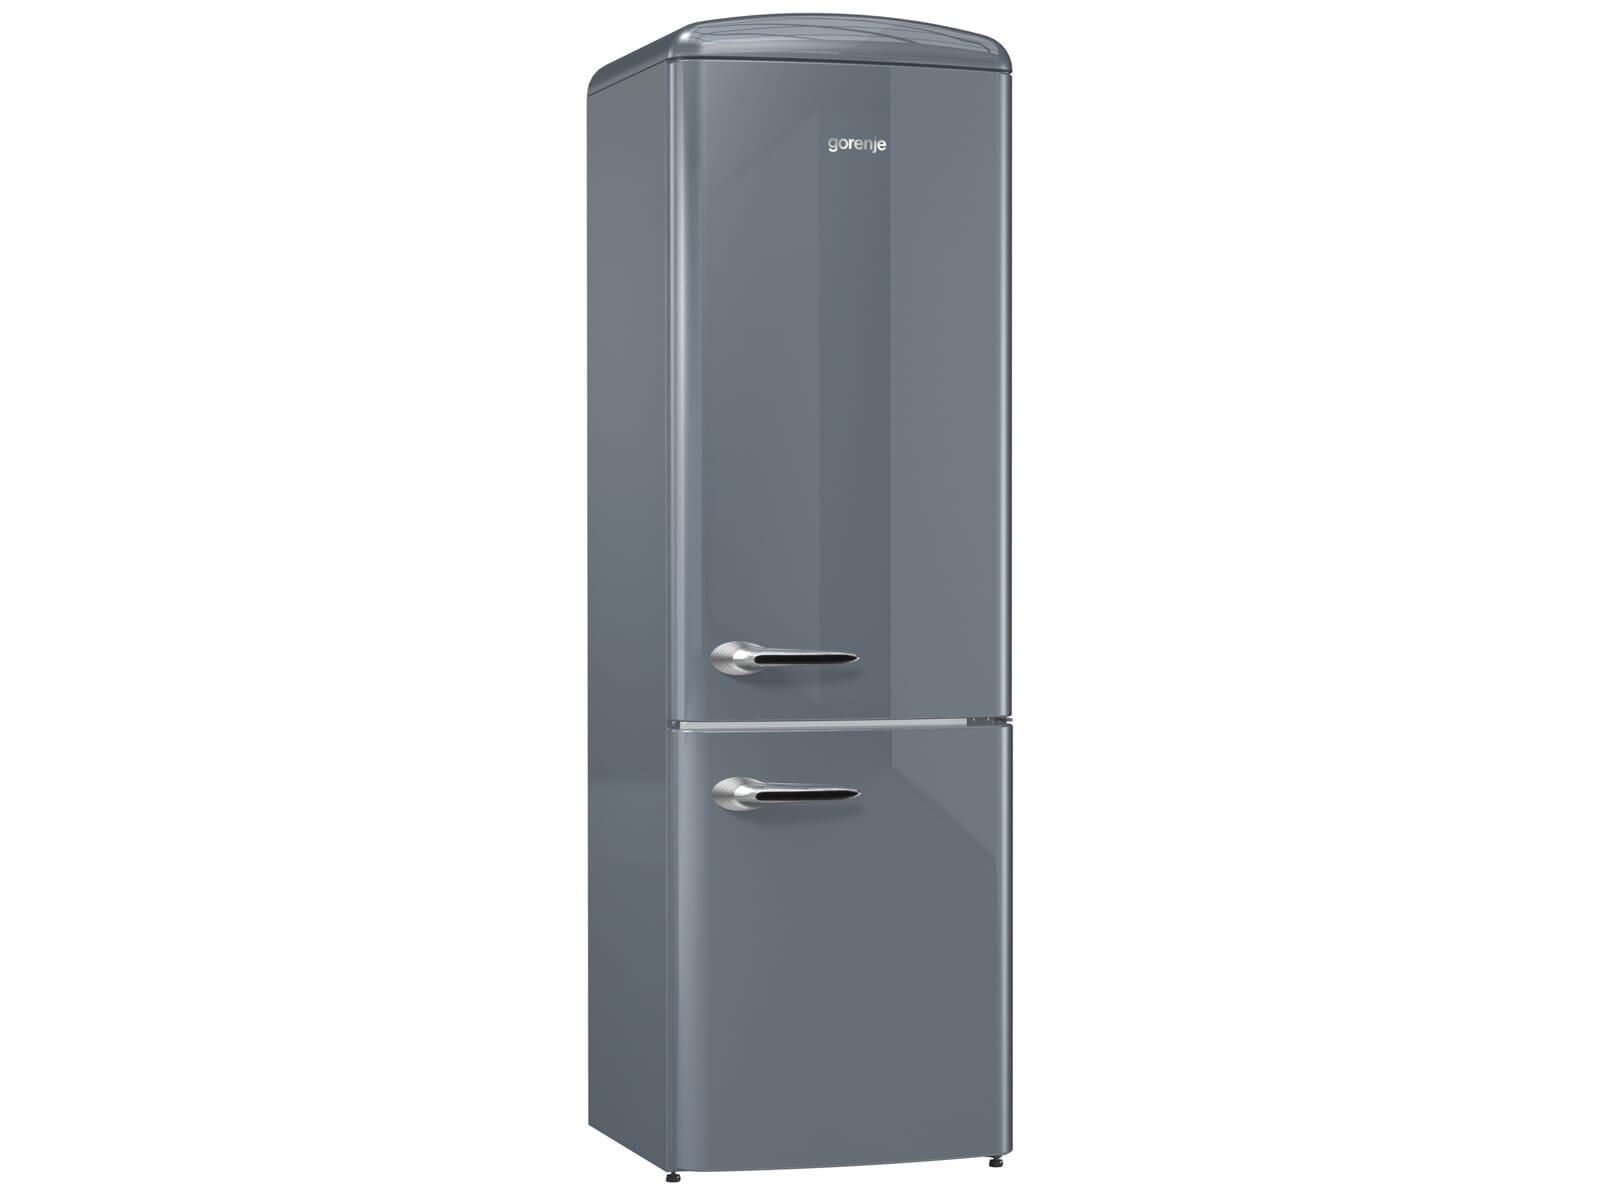 Samsung kühlschrank birne wechseln: kühlschrank led beleuchtung